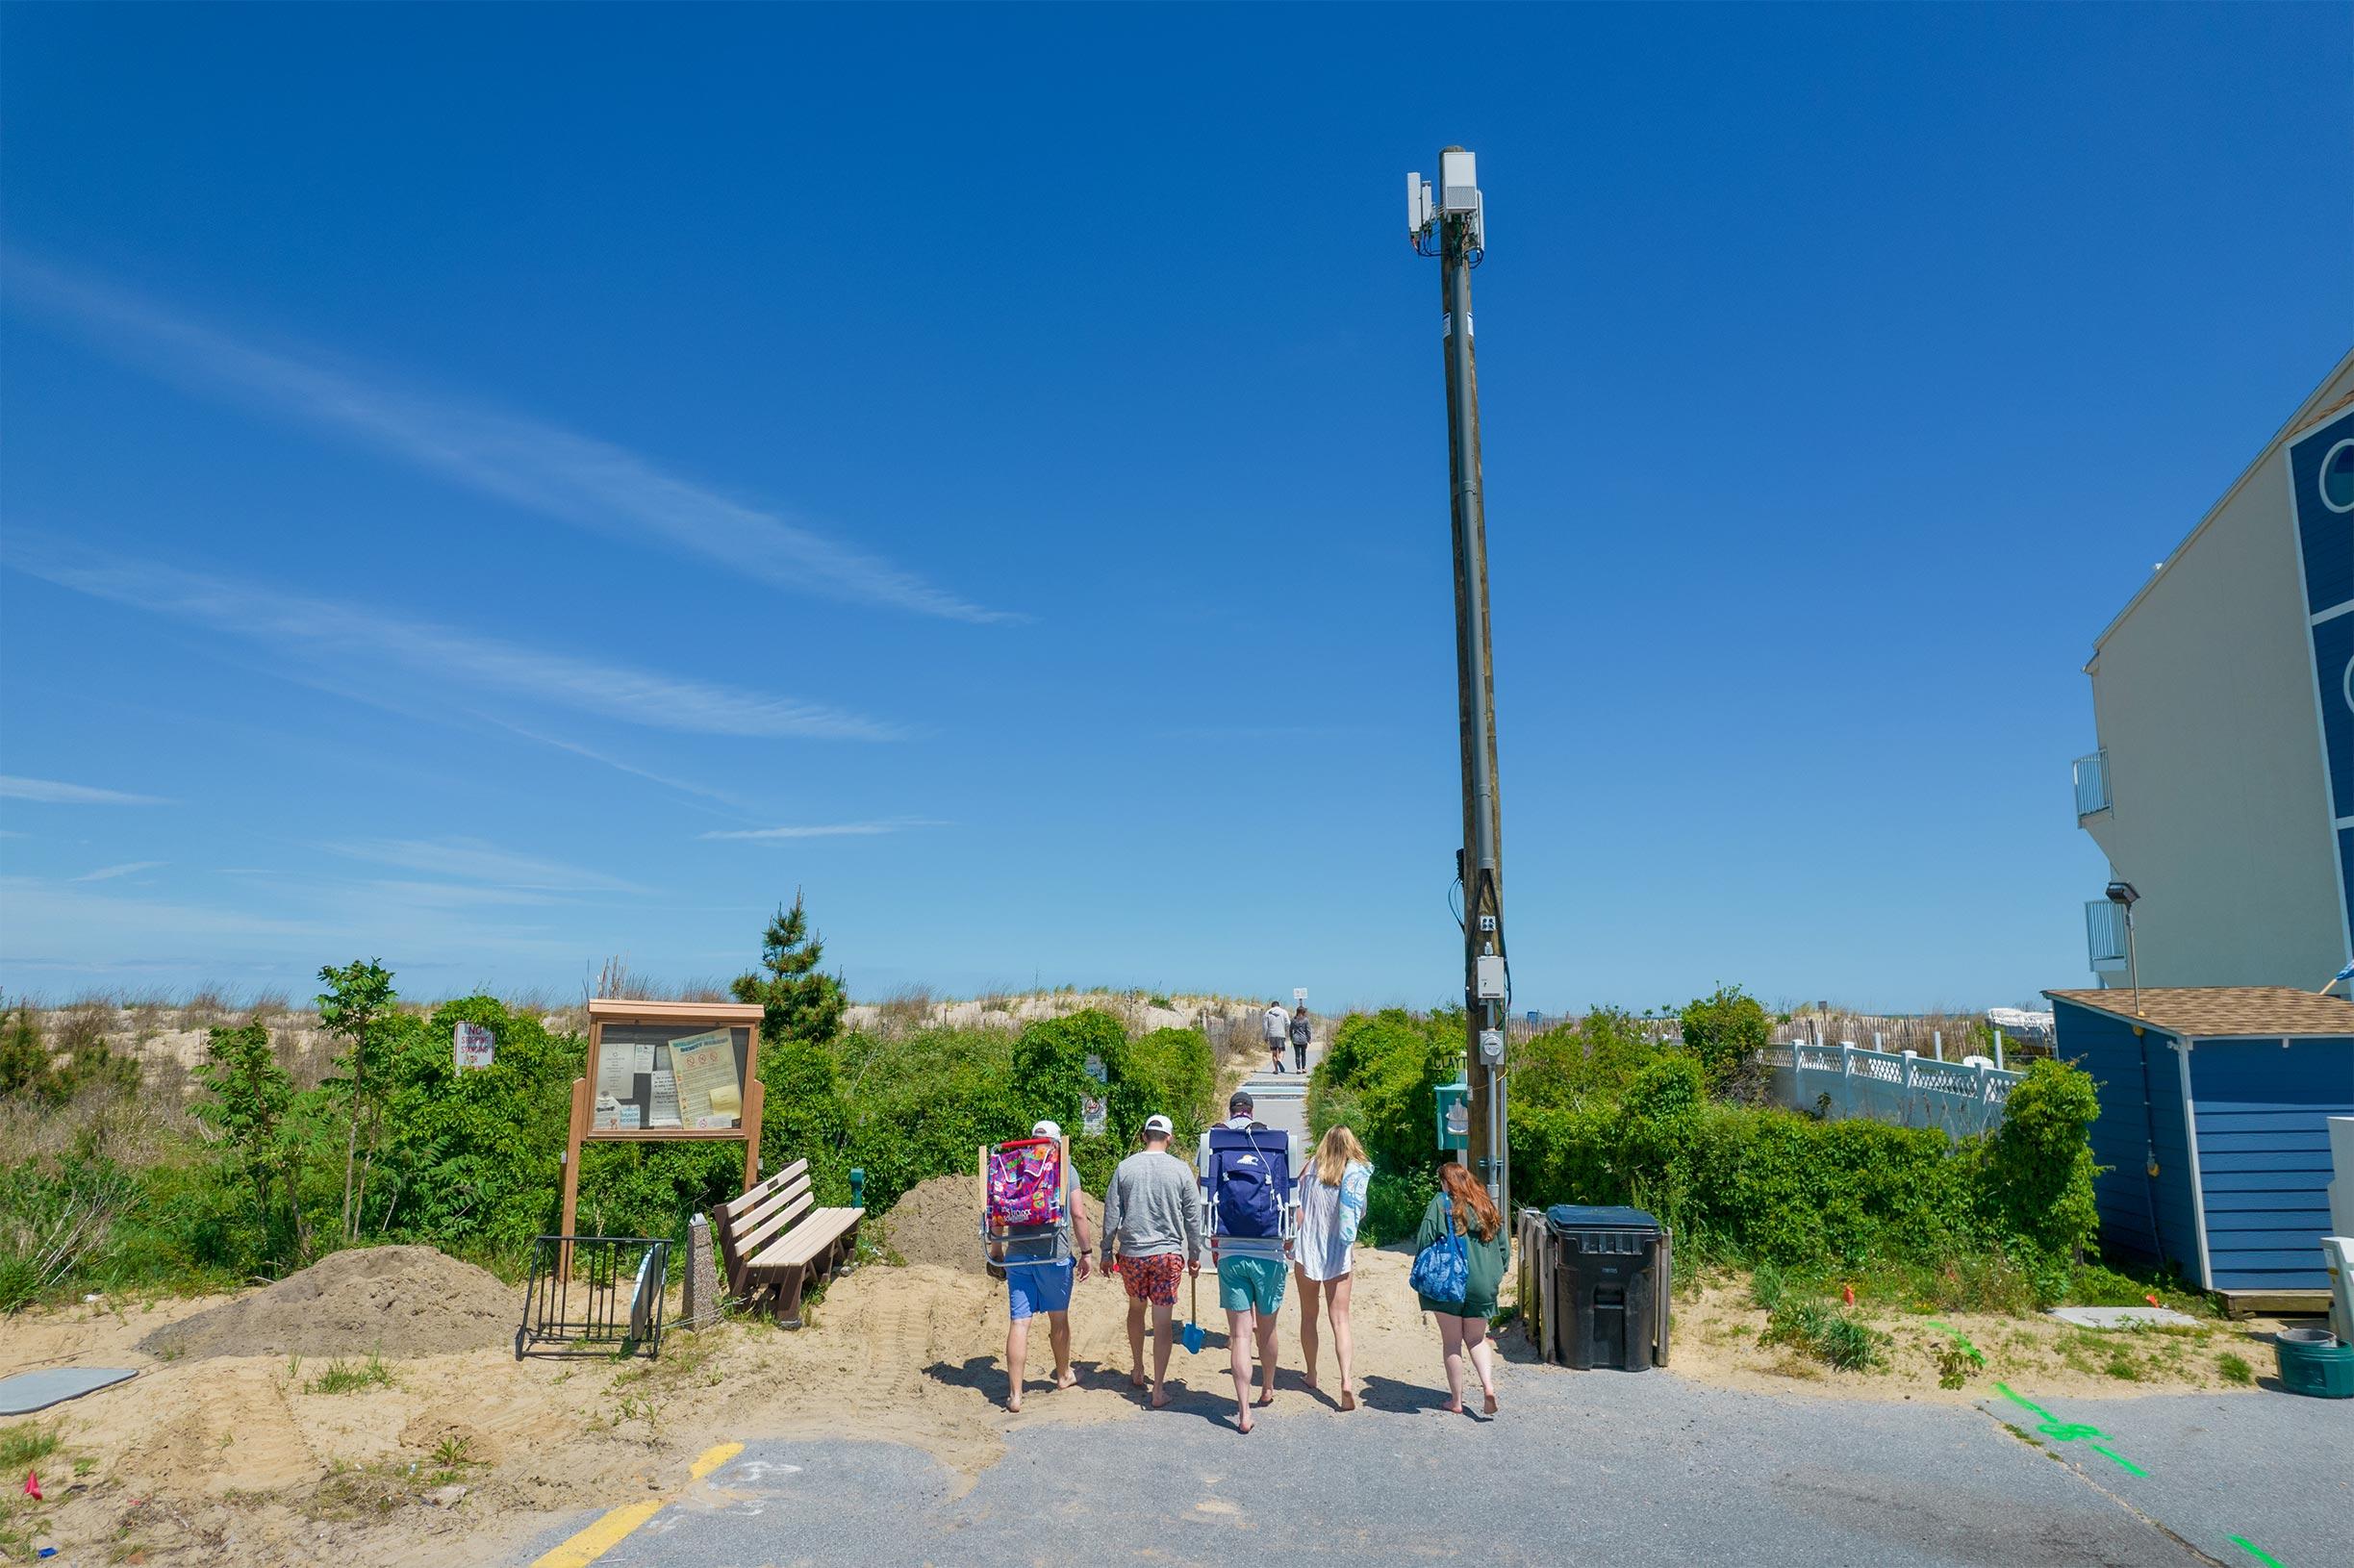 dewey beach 5G tower 9